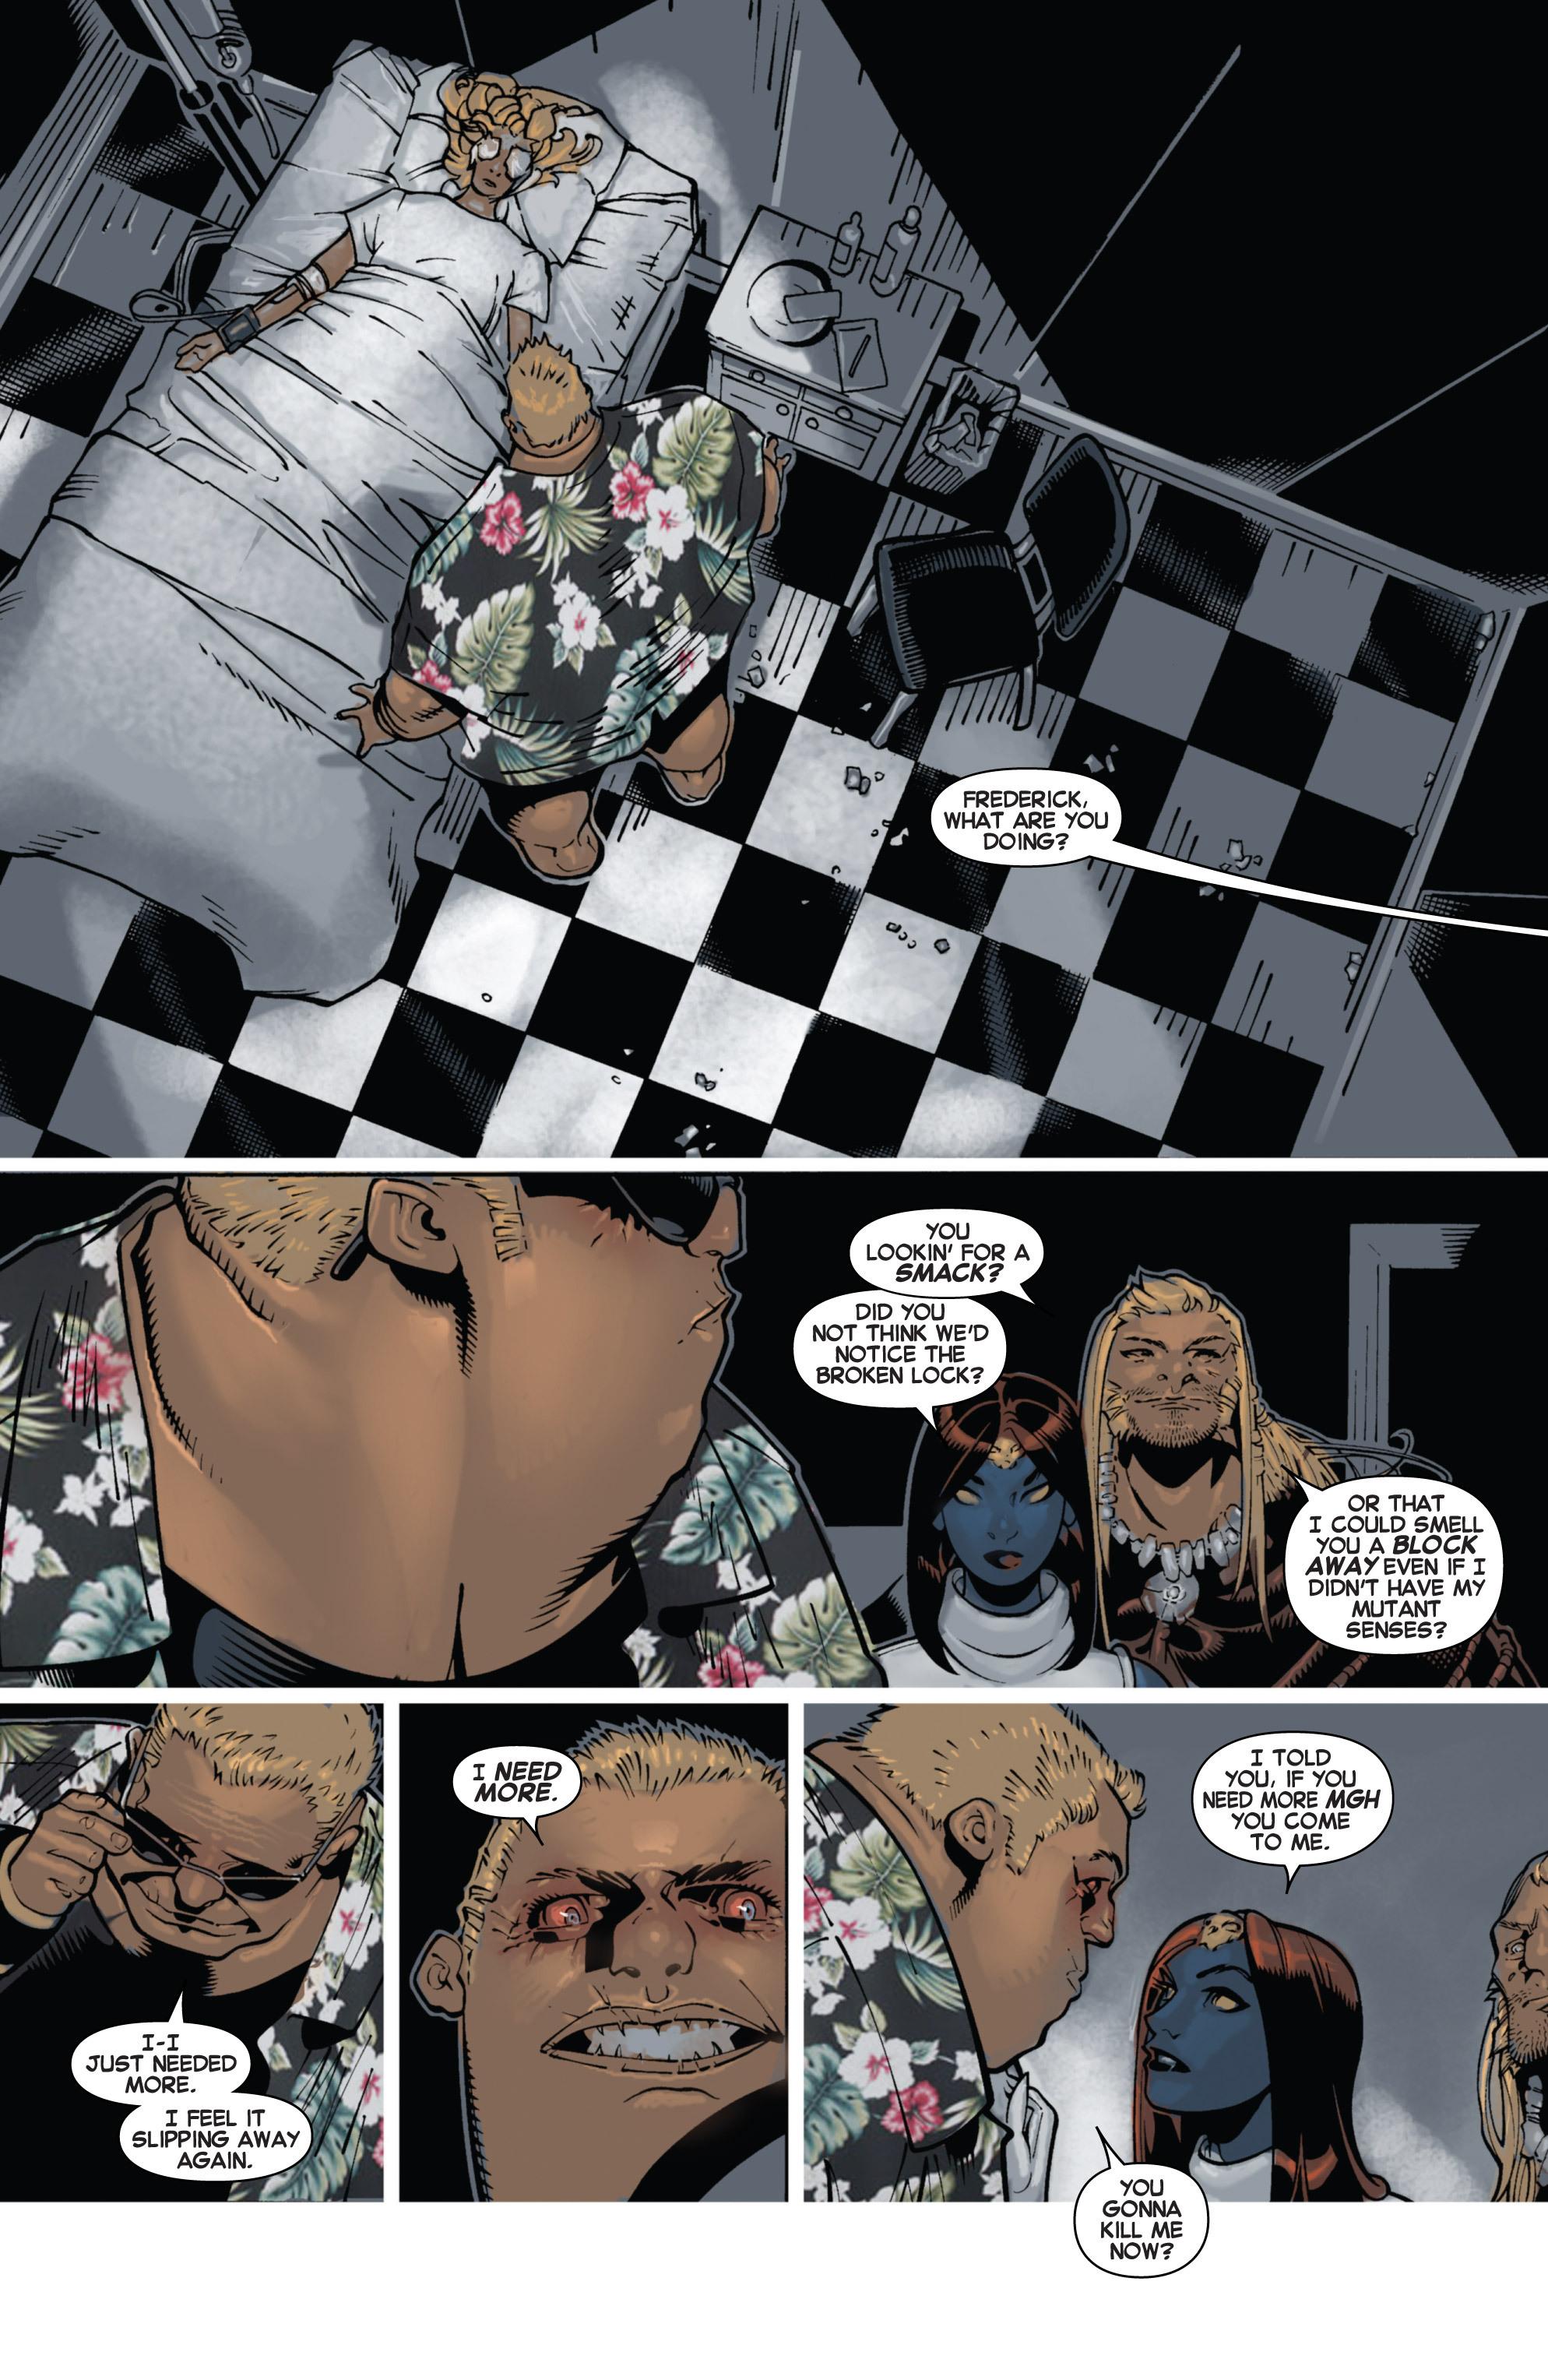 Read online Uncanny X-Men (2013) comic -  Issue # _TPB 4 - vs. S.H.I.E.L.D - 30